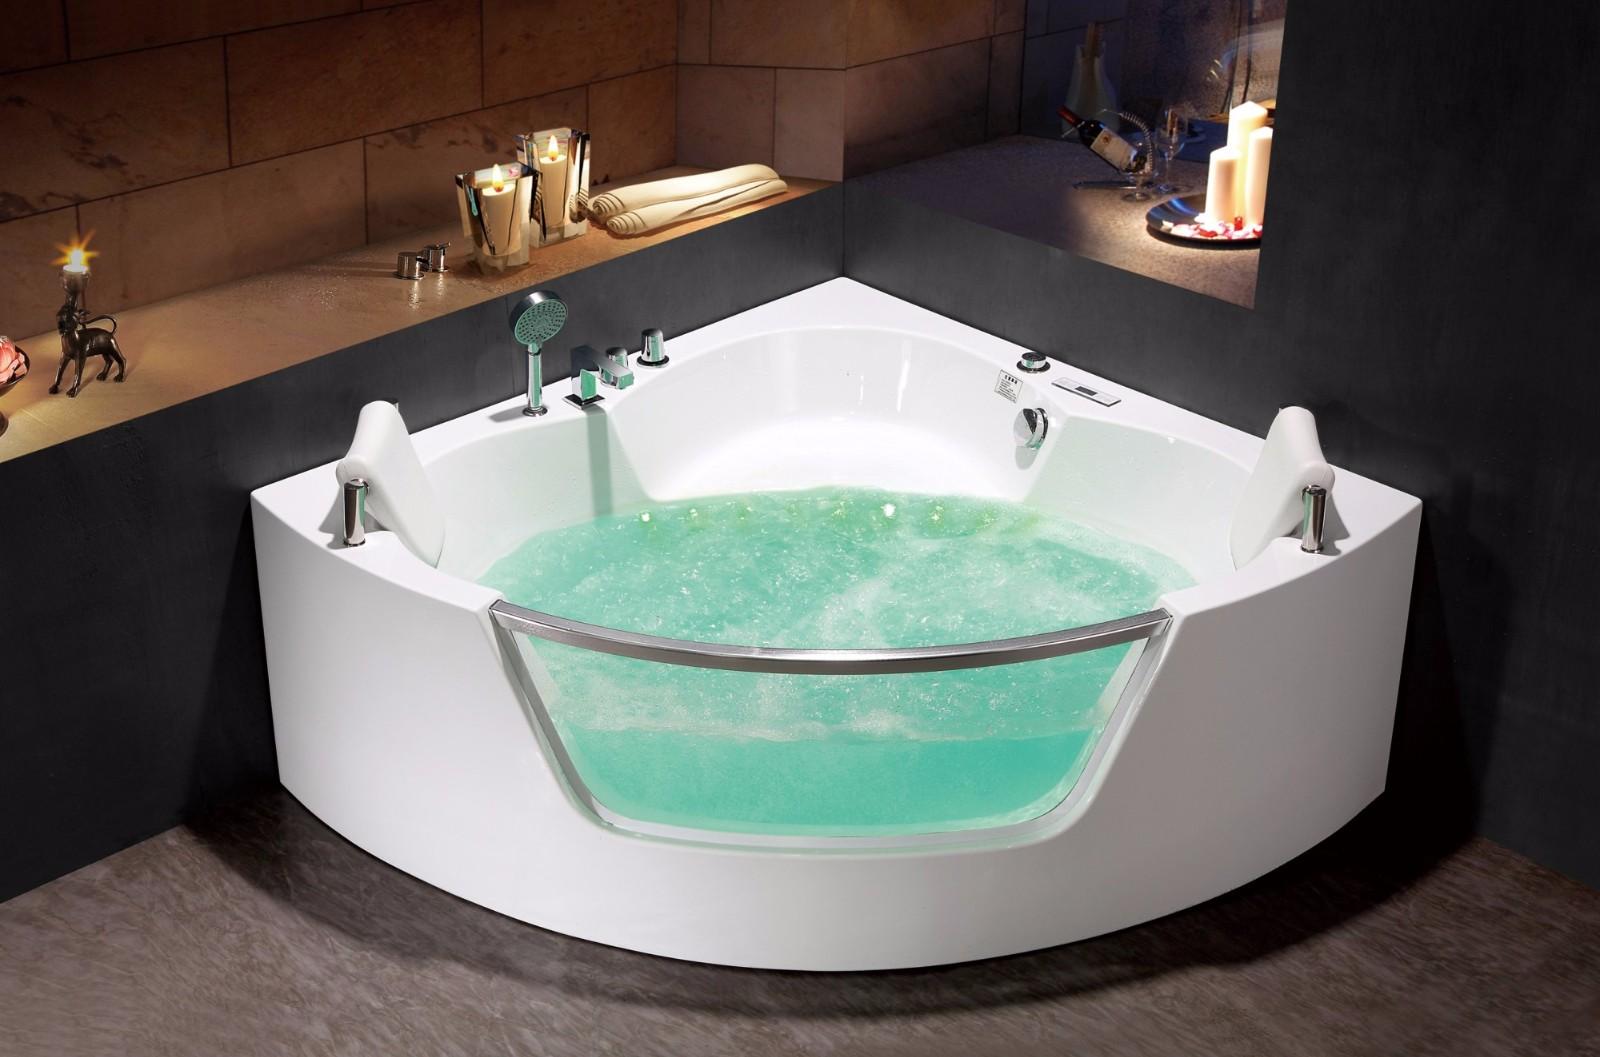 C-448 C-449Bathroom Bathtub with Cheap Price_副本.jpg